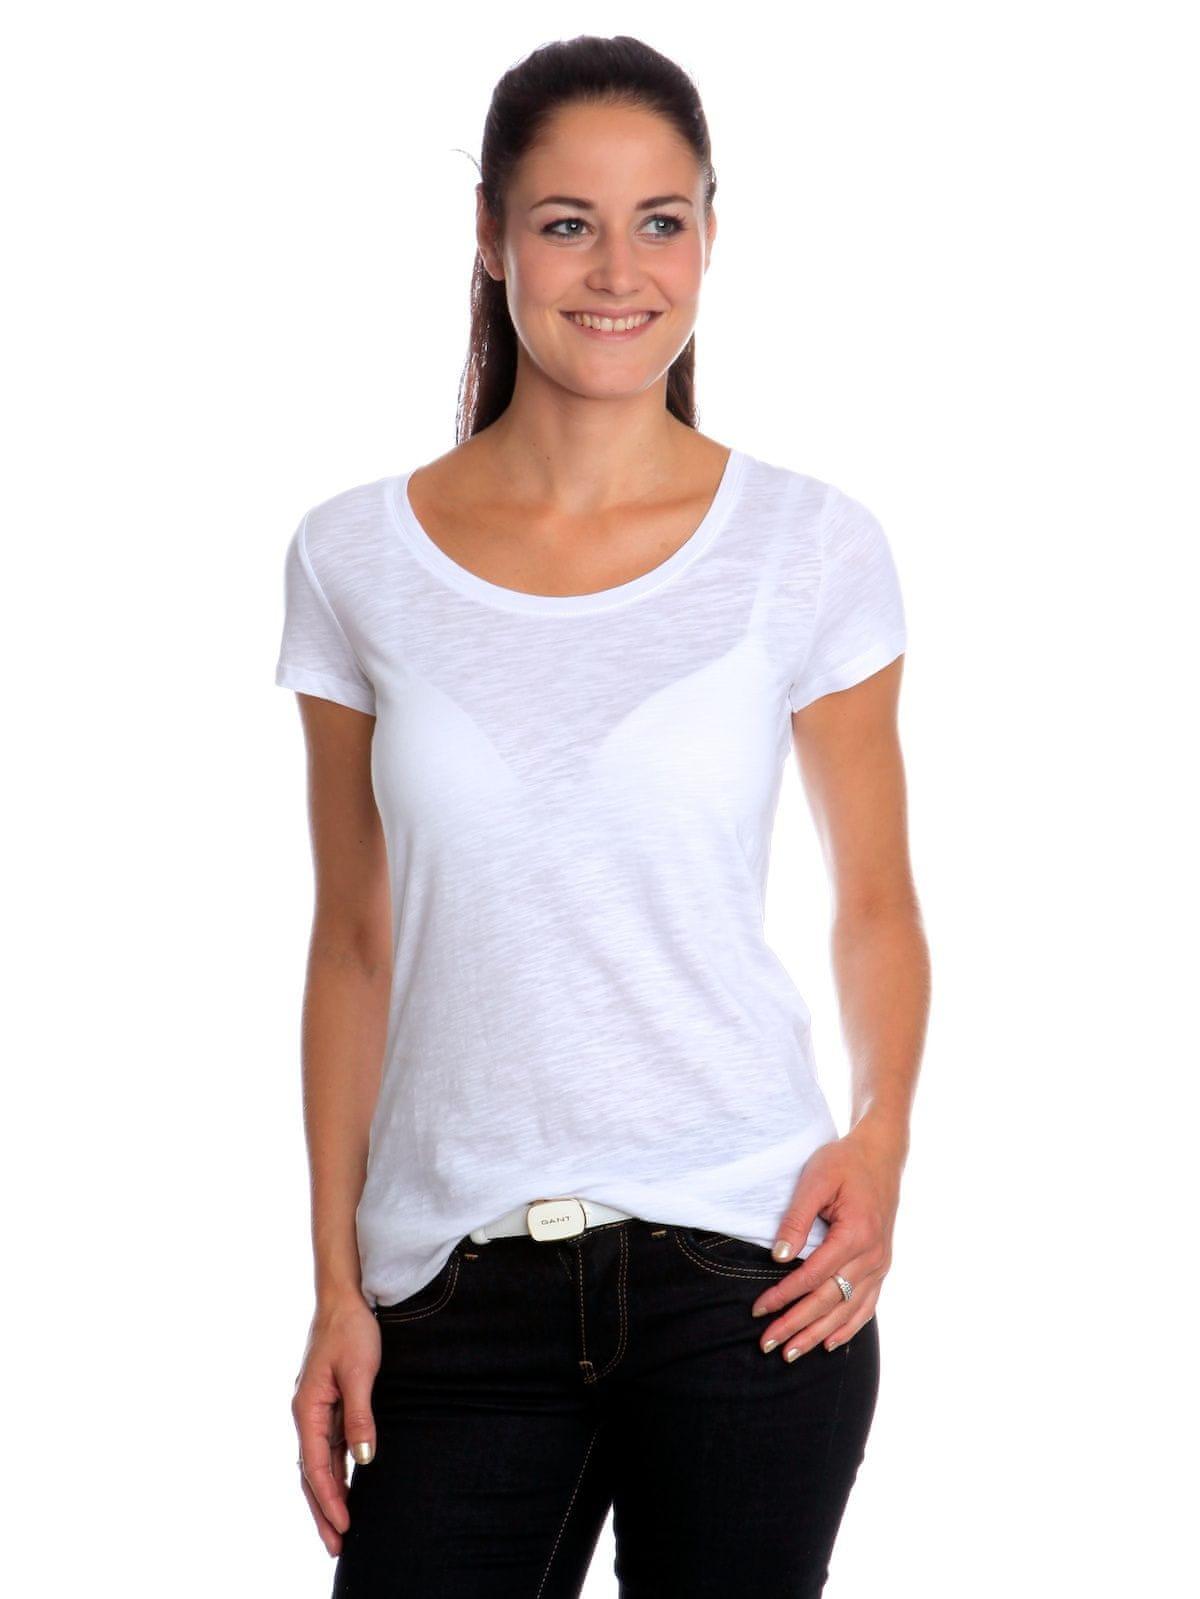 s.Oliver T-shirt damski 40 biały